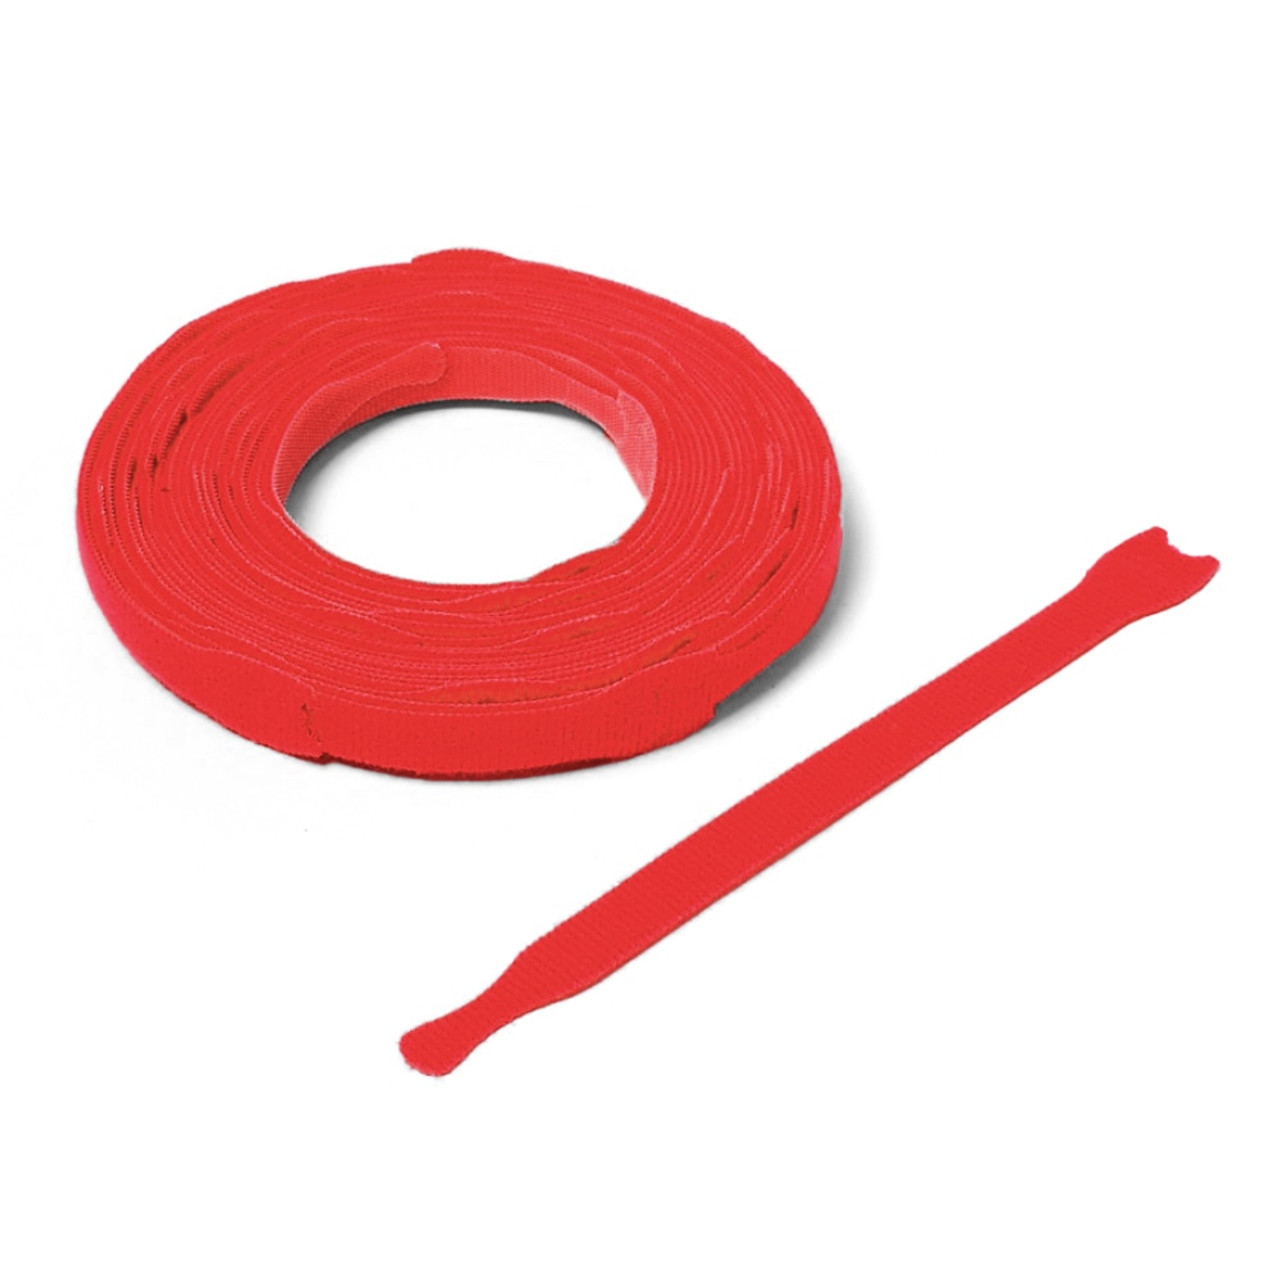 VELCRO ® Brand ONE-WRAP ® Die-Cut Straps - Red / Velcro Straps - Bundling Straps - Velcro Tie - Velcro Strap